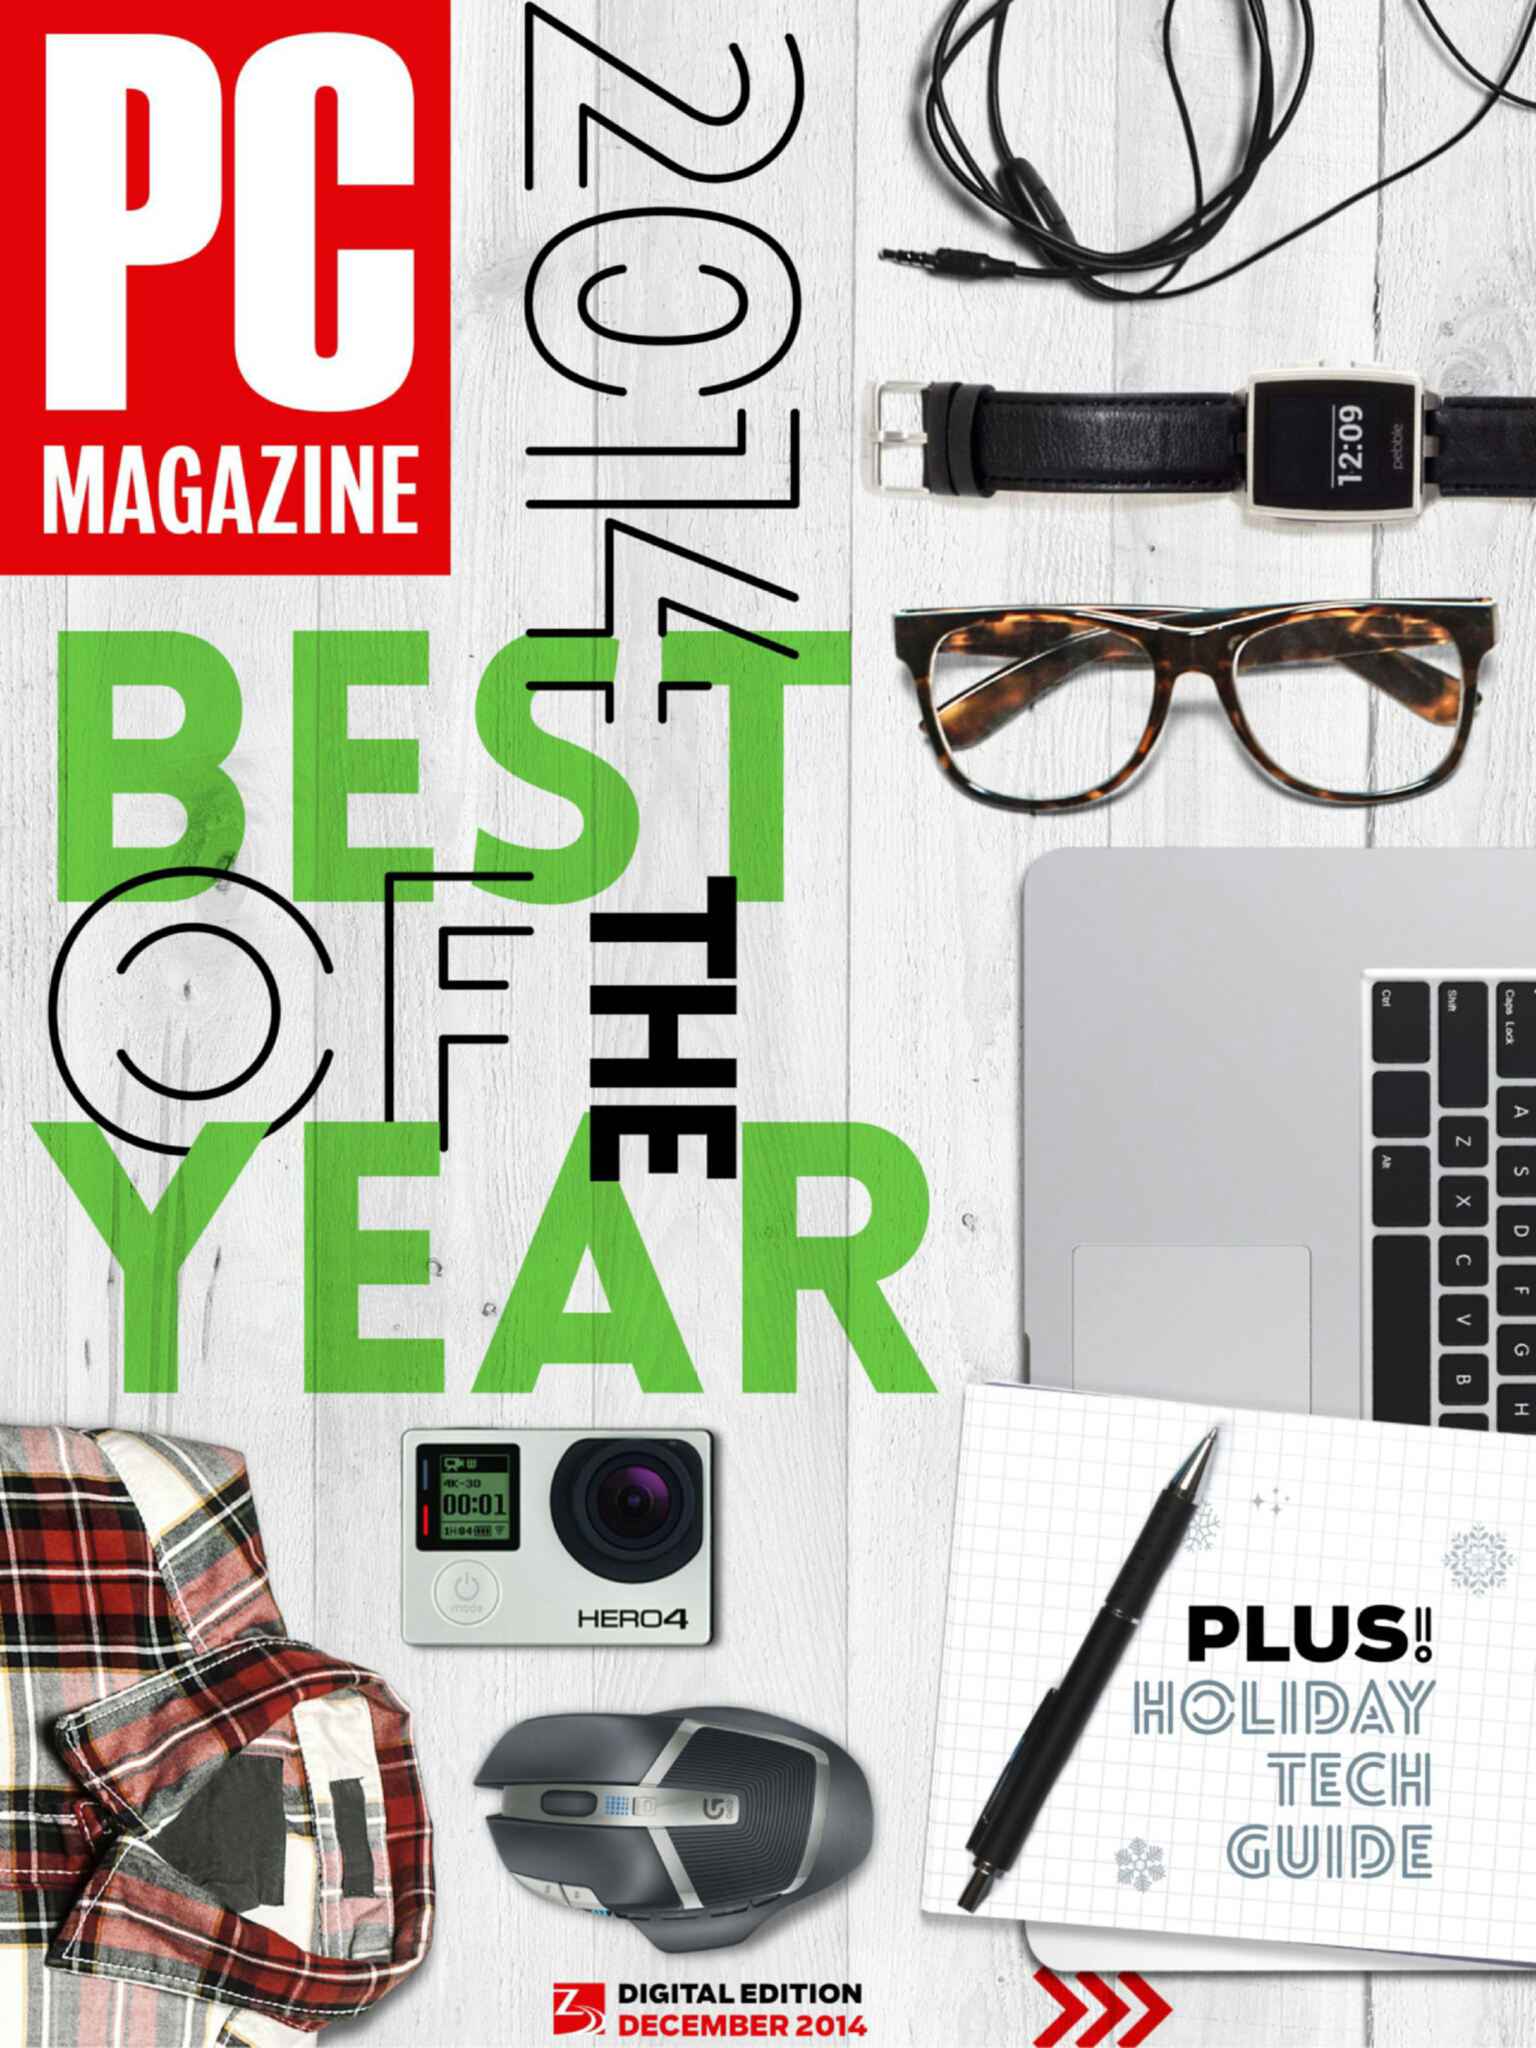 Enttech - Magazine cover